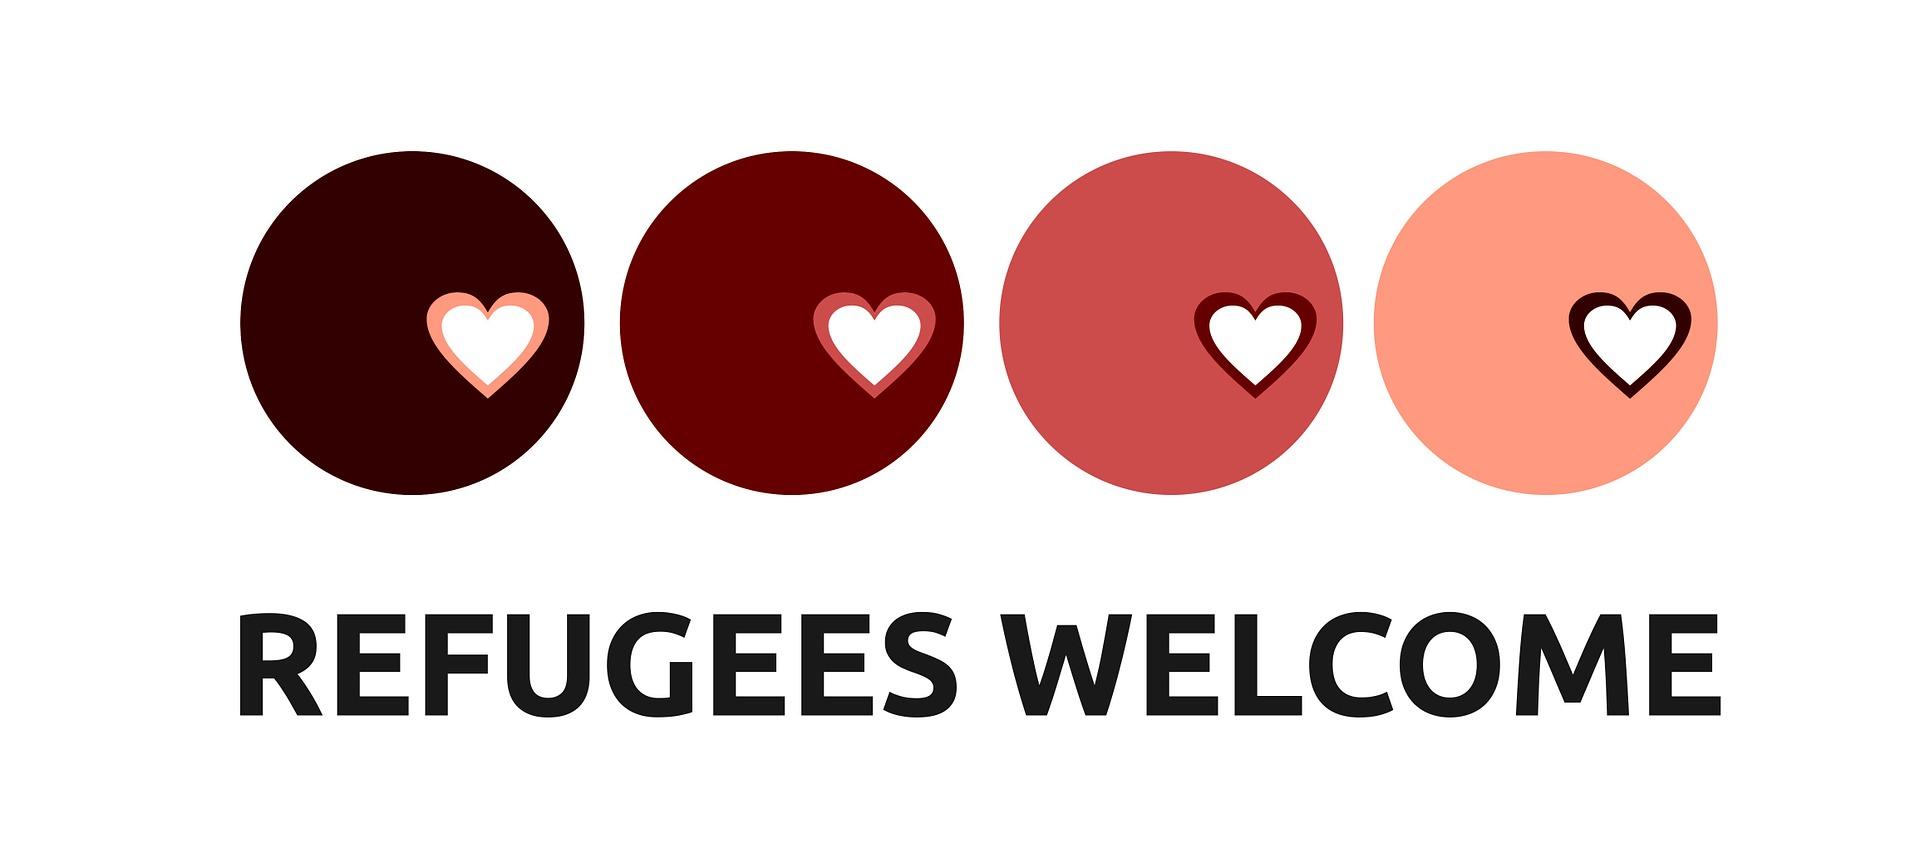 refugees-1186359_1920